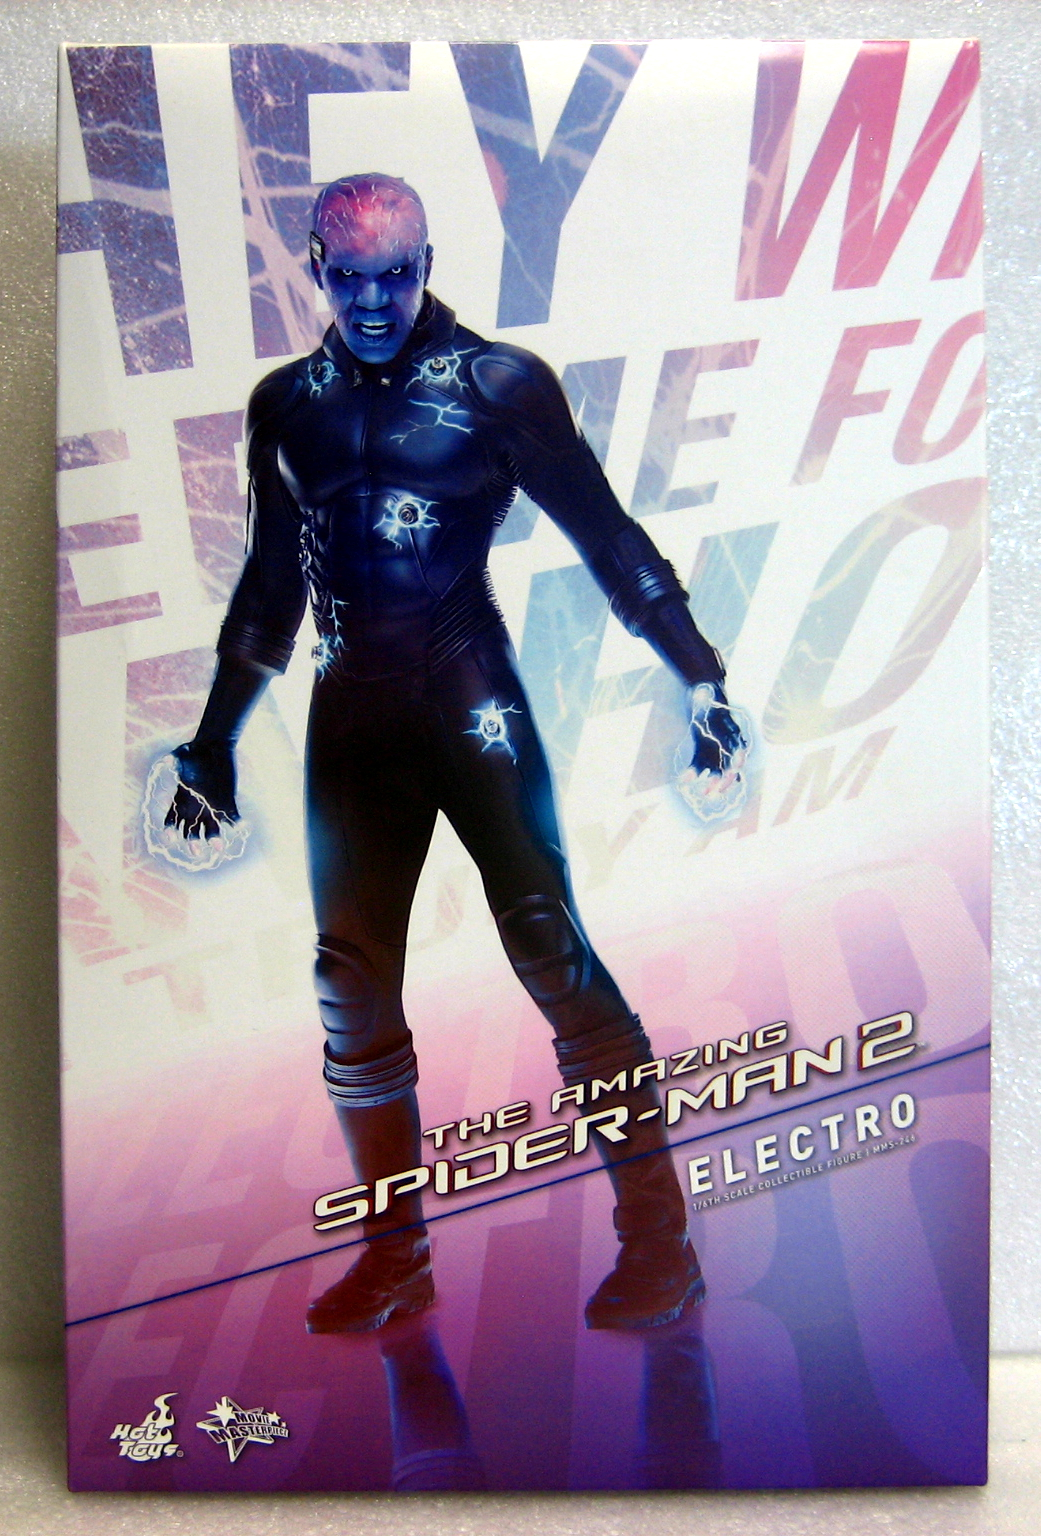 hot toys amazing spider-man 2 electro box front